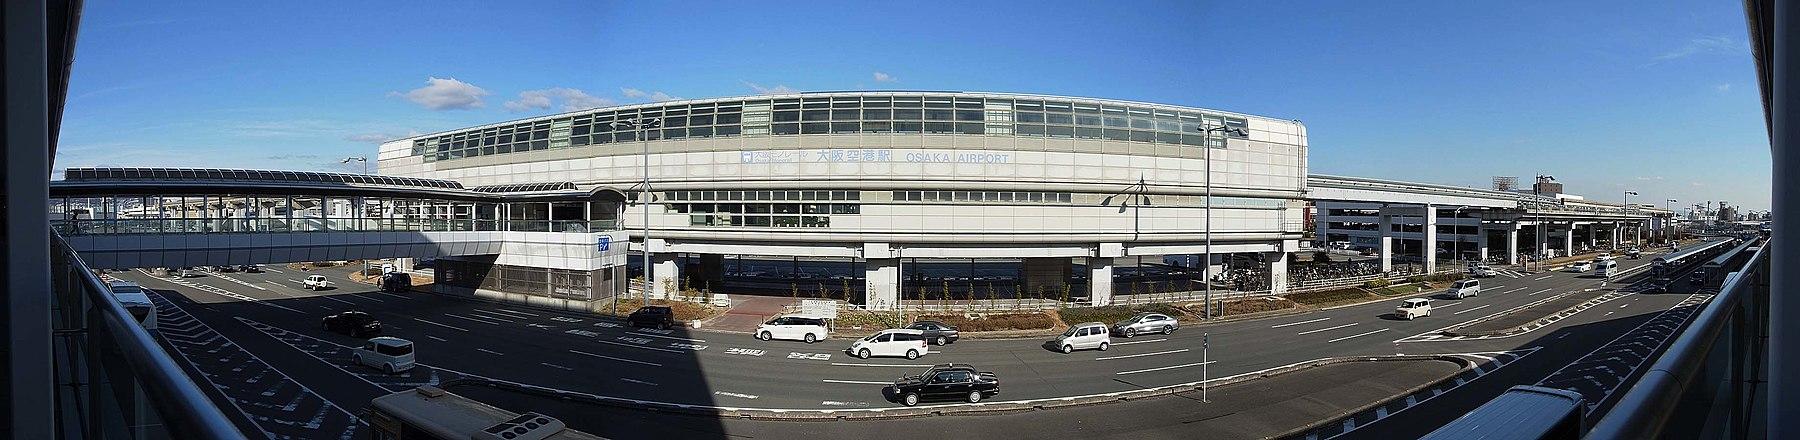 Osaka Monorail Osaka Airpot station , 大阪空港駅 - panoramio.jpg